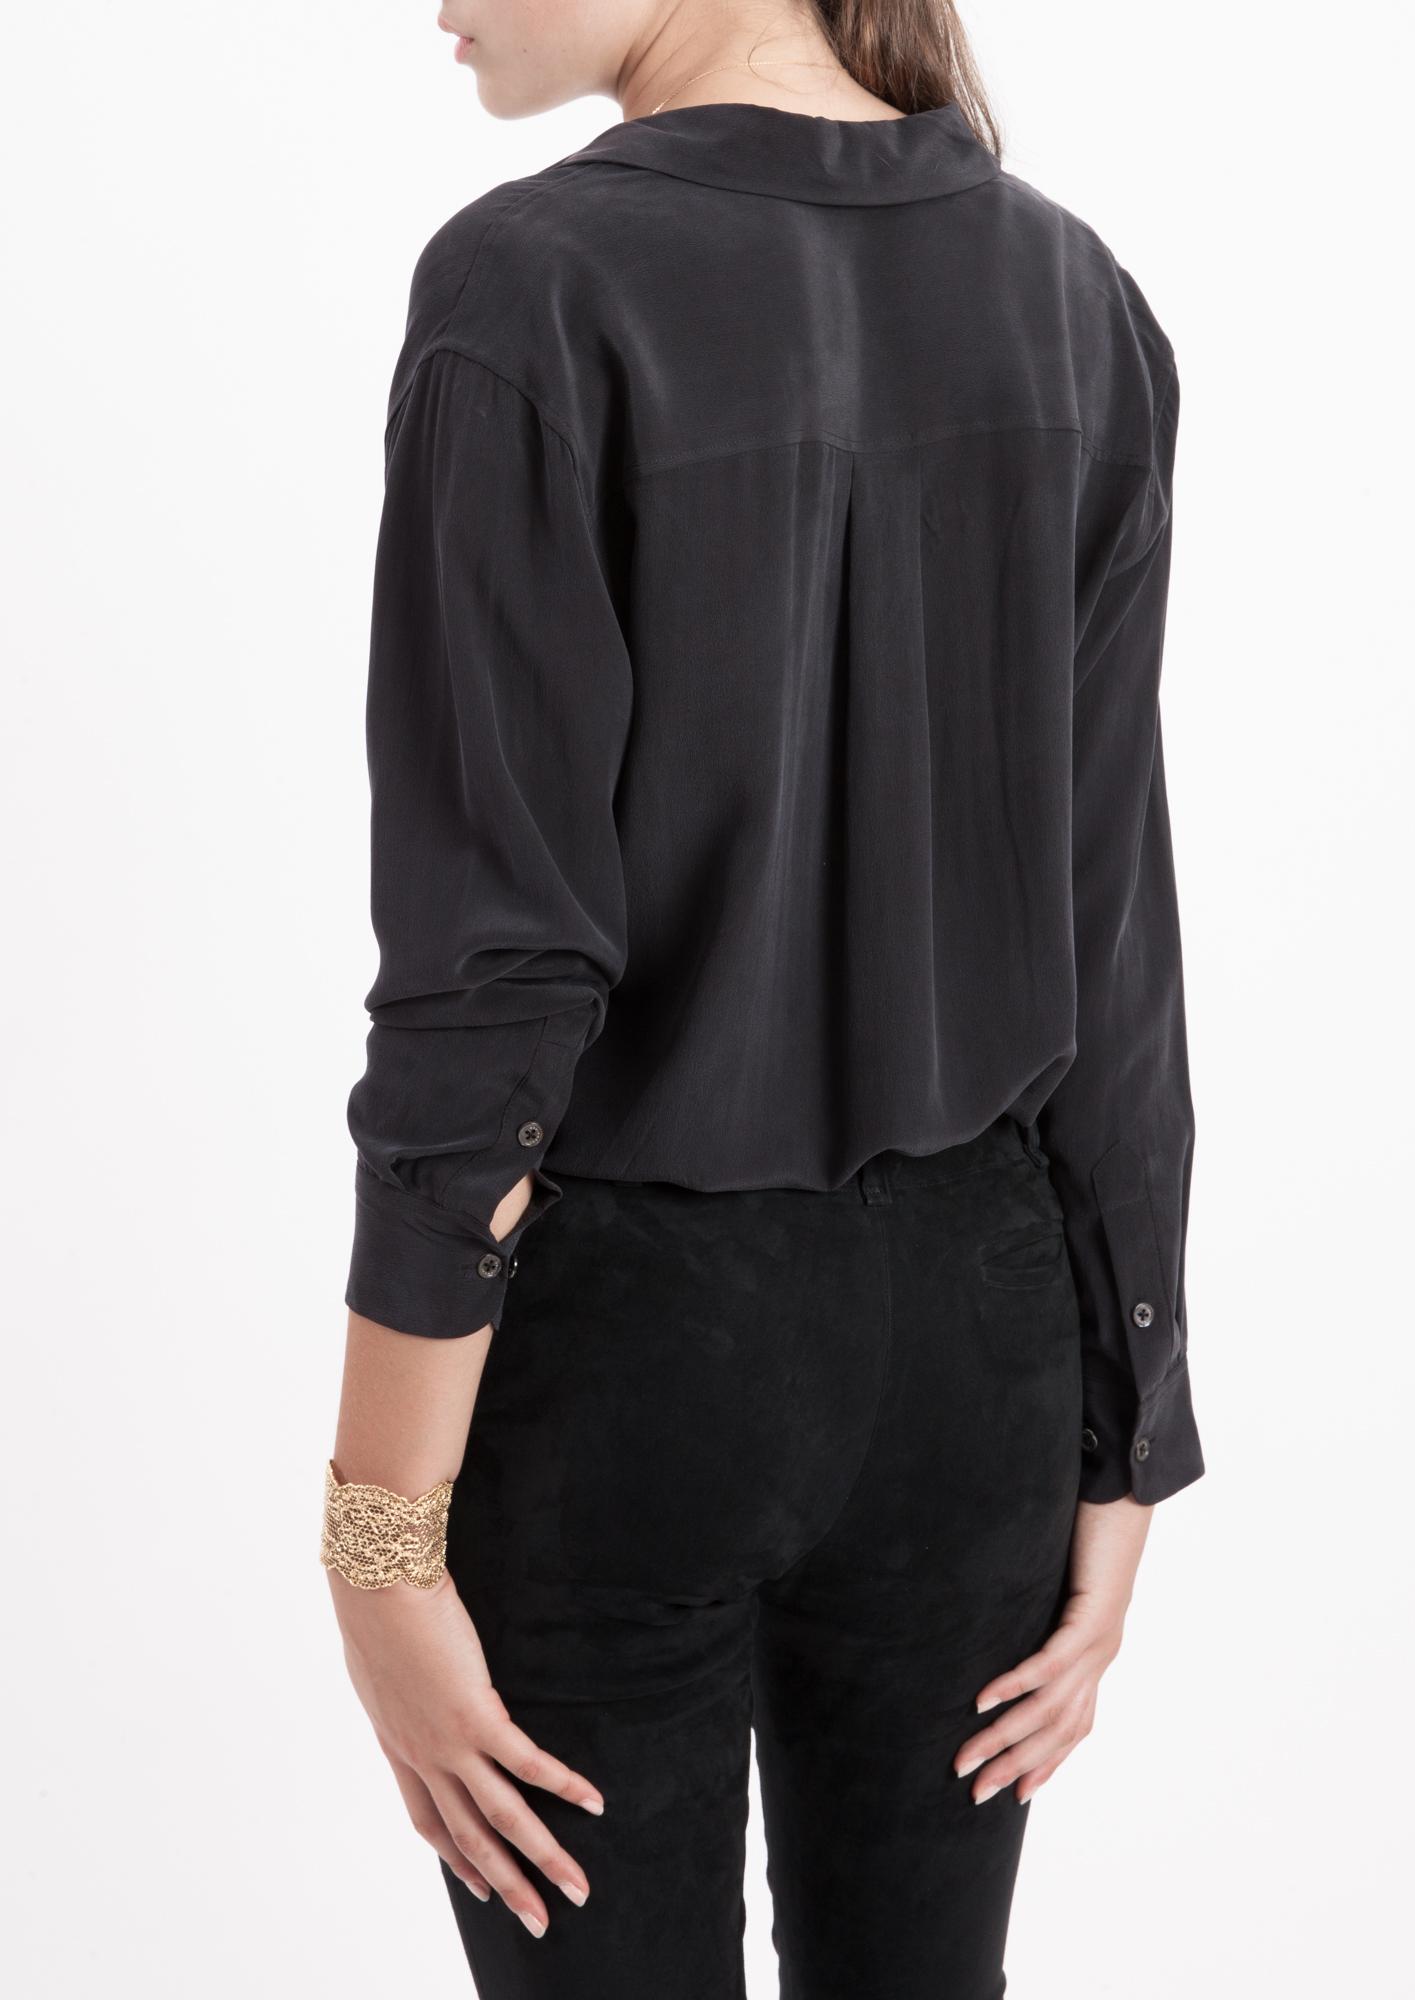 Equipment true black daddy silk shirt in black lyst for Equipment black silk shirt